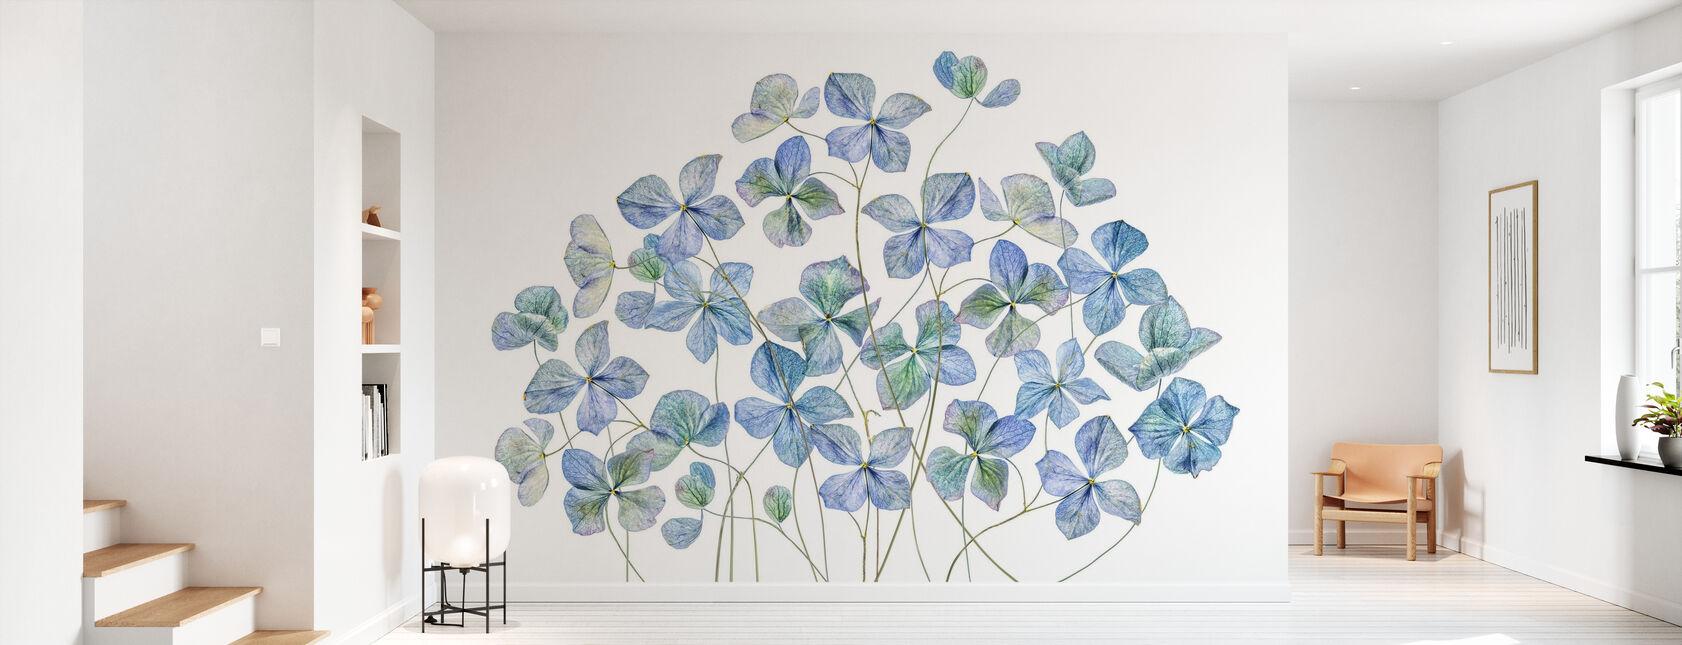 Hydrangea - Wallpaper - Hallway